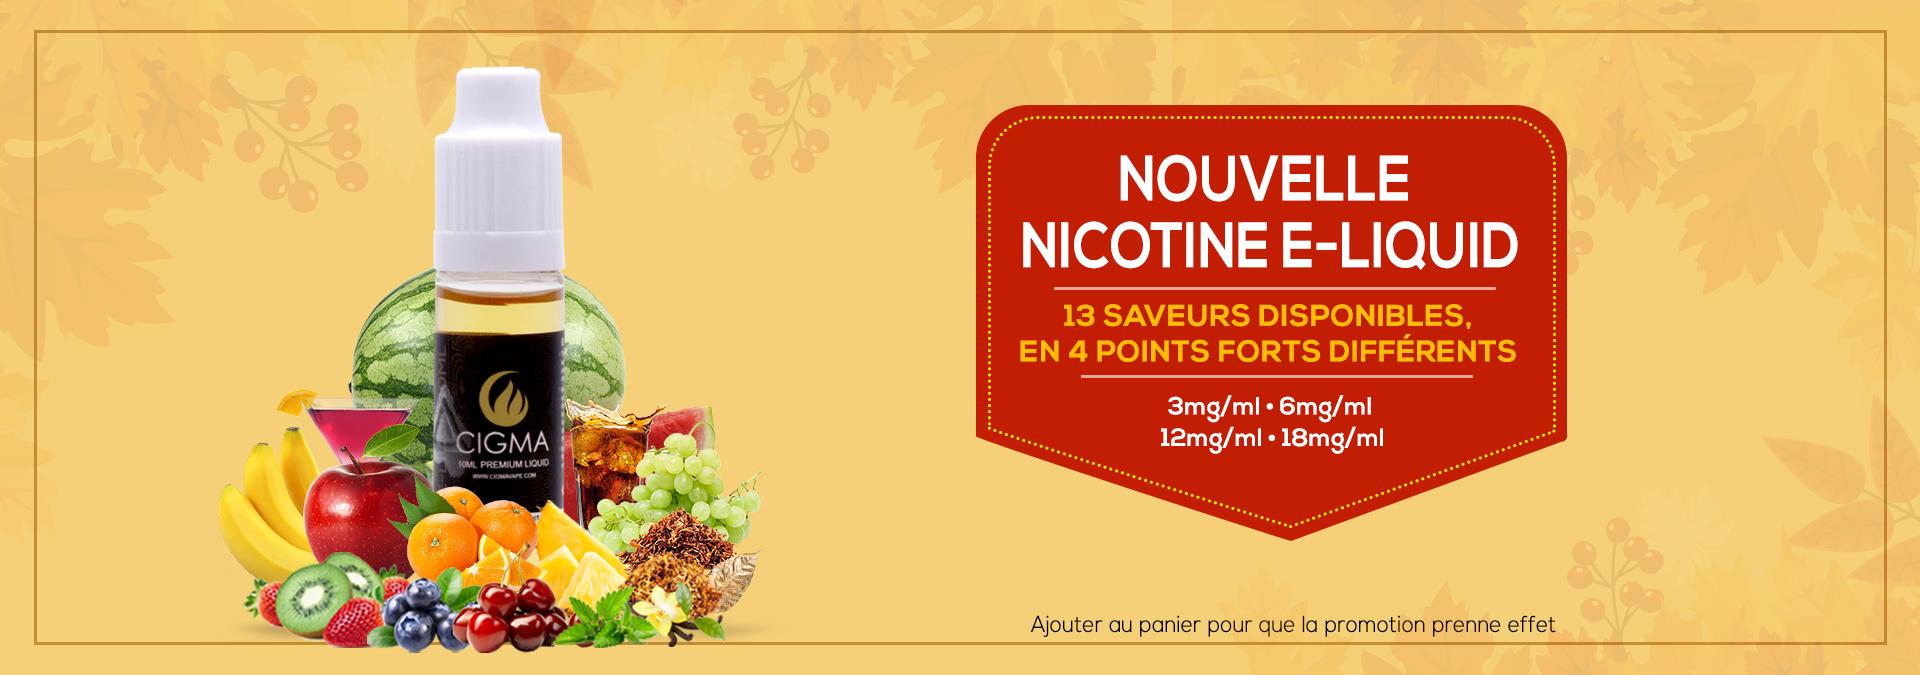 Nicotine eliquids